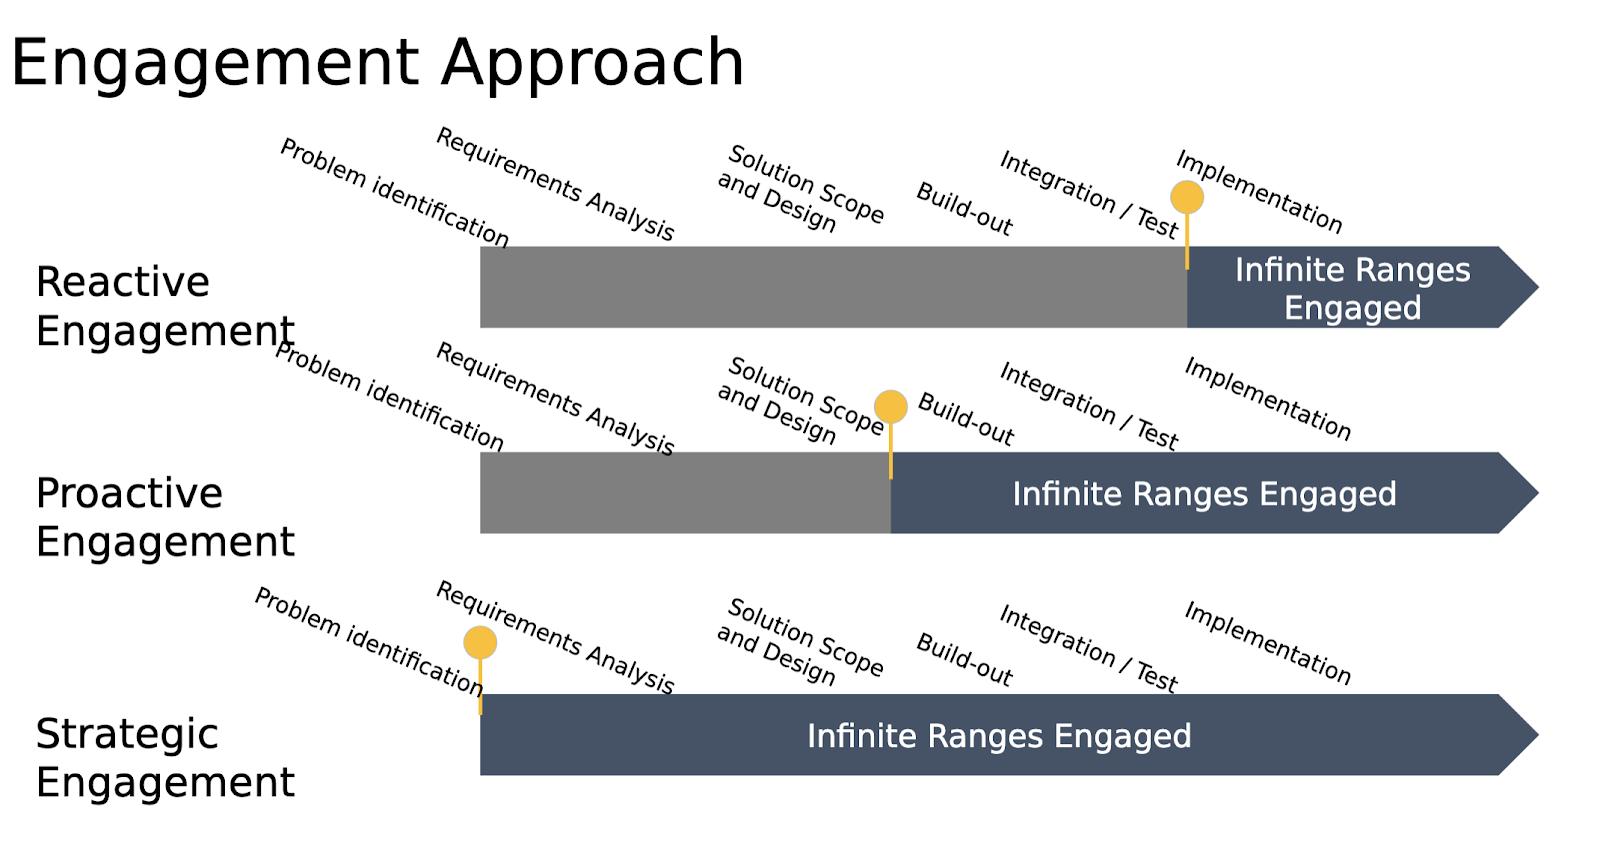 Infinite Ranges Engagement Chart